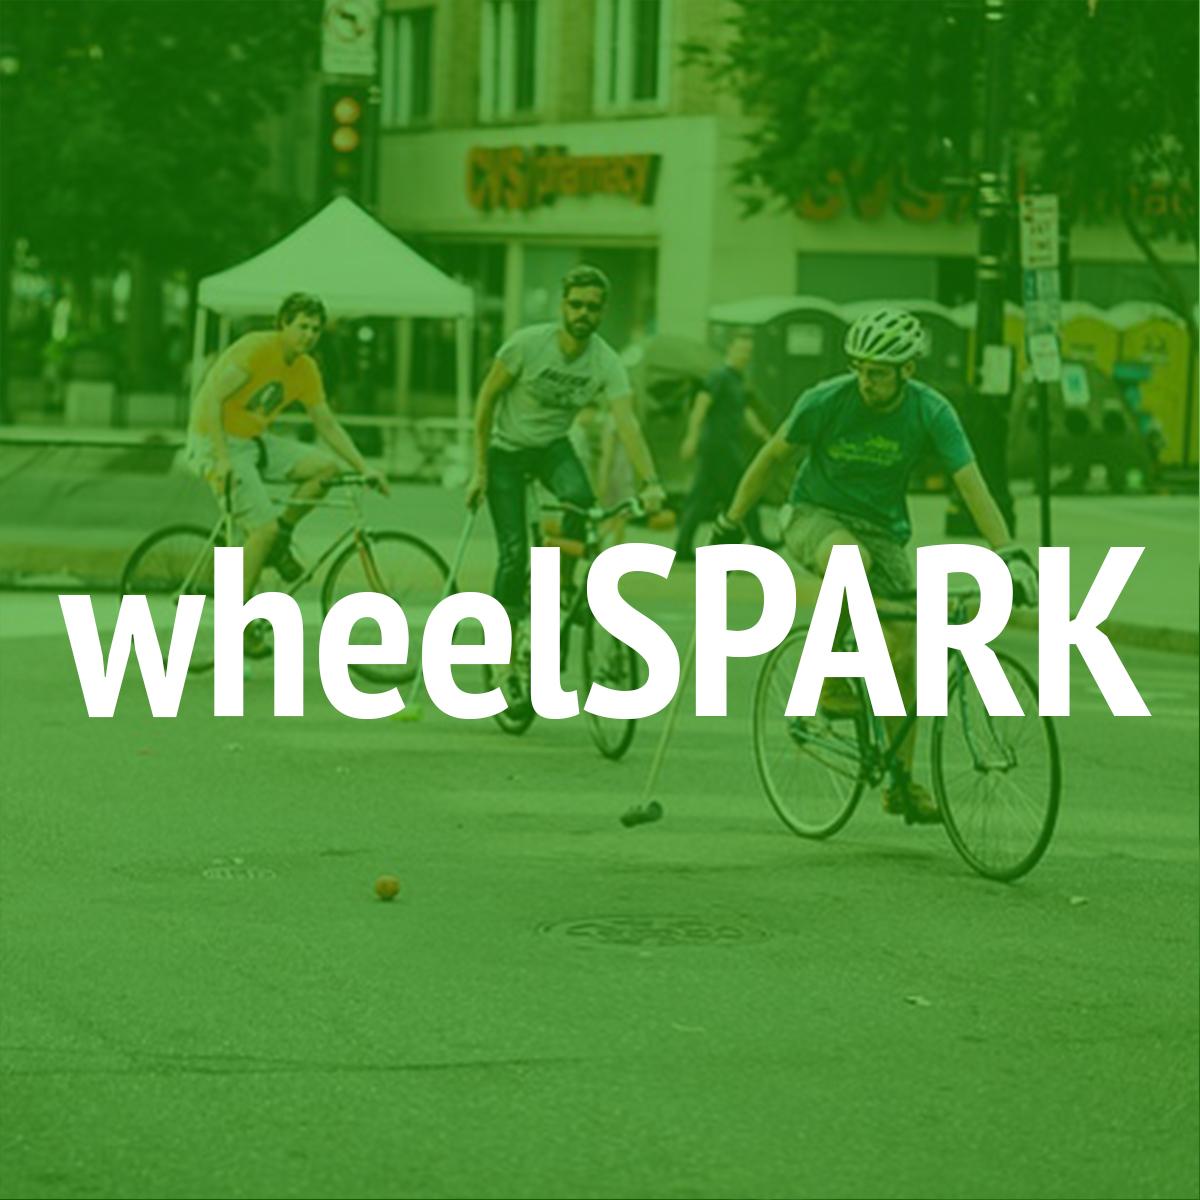 wheelspark.jpg